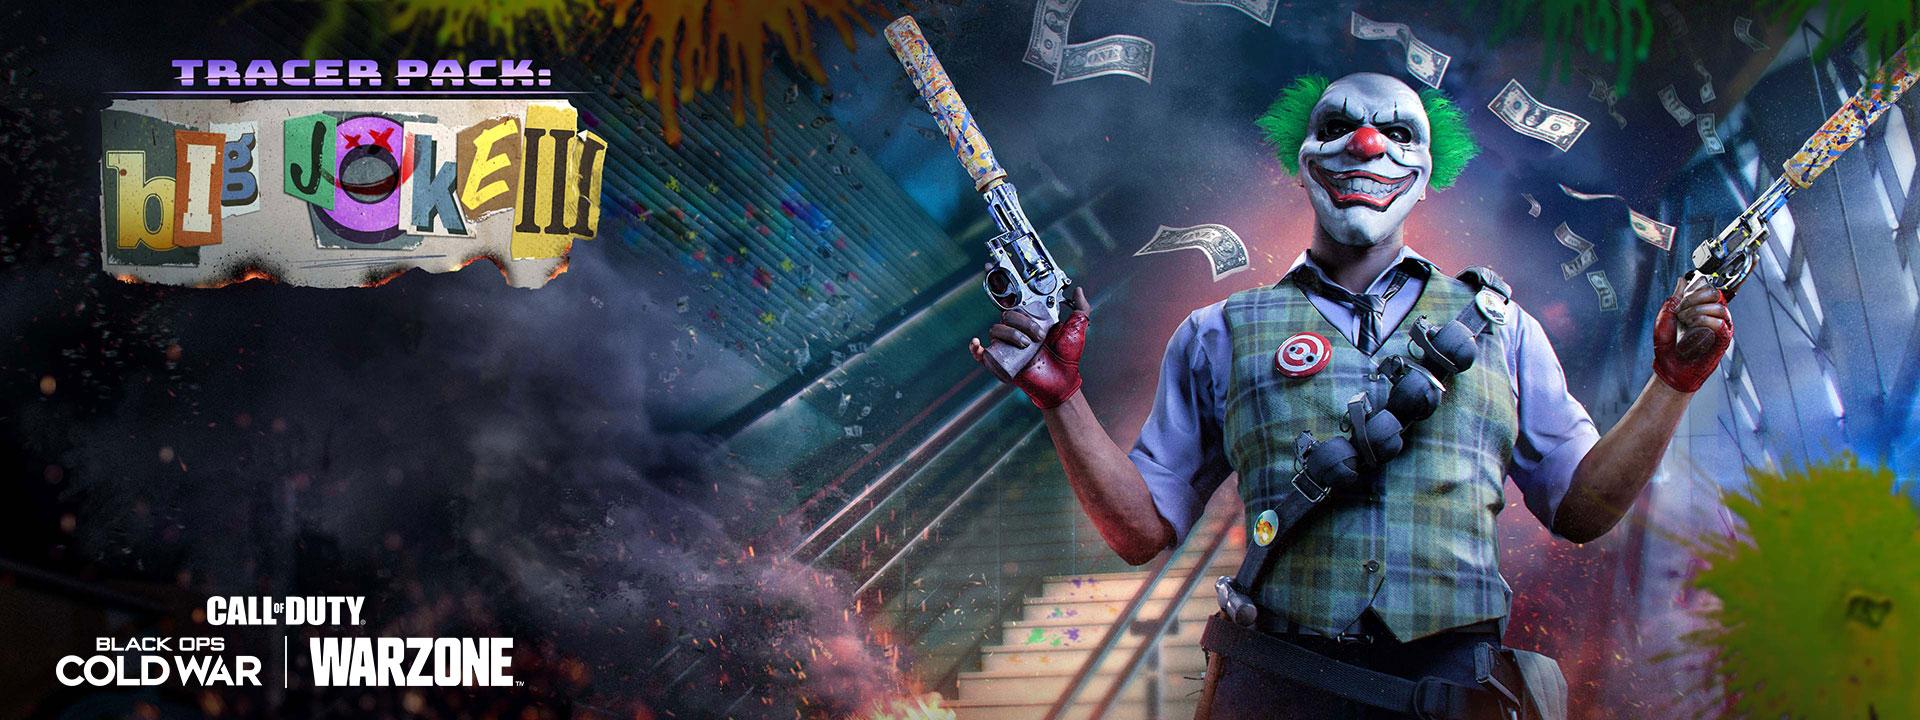 Man with clown mask dual wields guns as money floats down around him